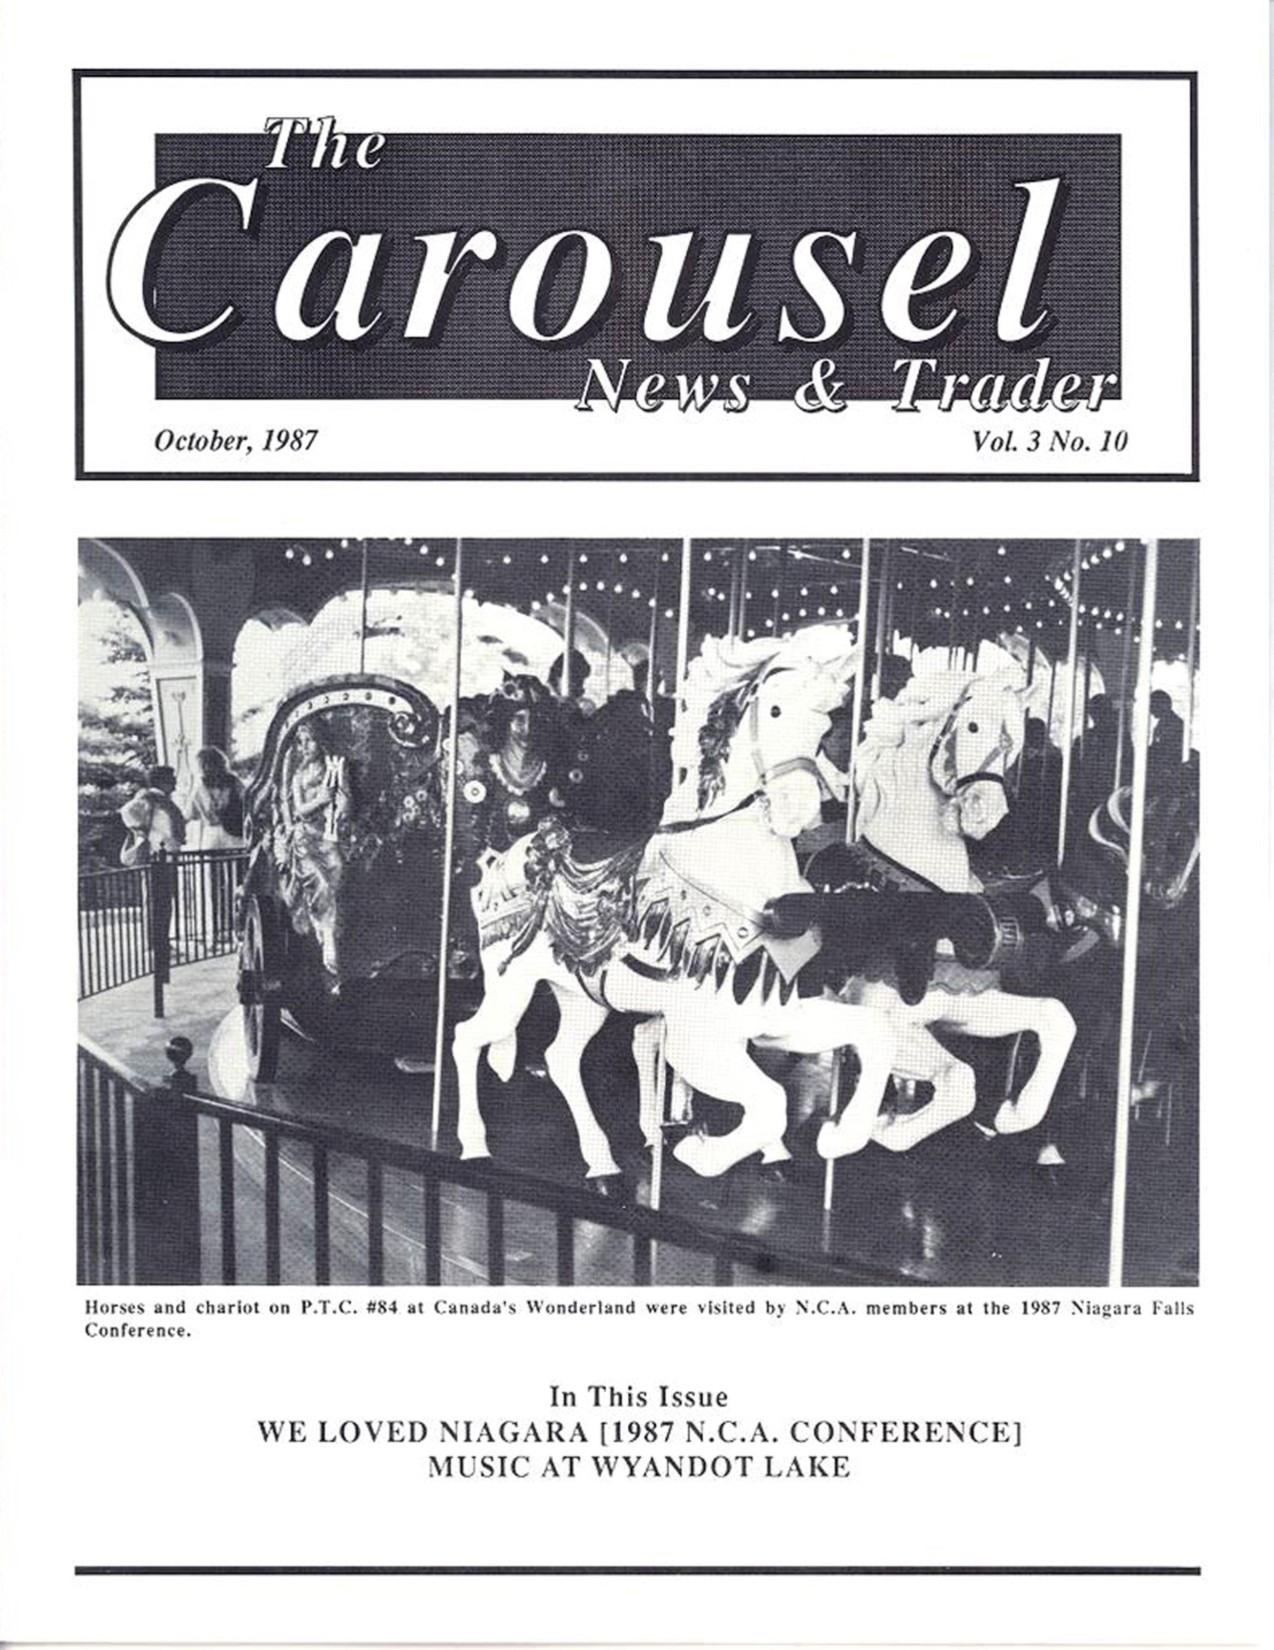 Carousel-News-cover-10_1987-PTC-84-Canadas-Wonderland